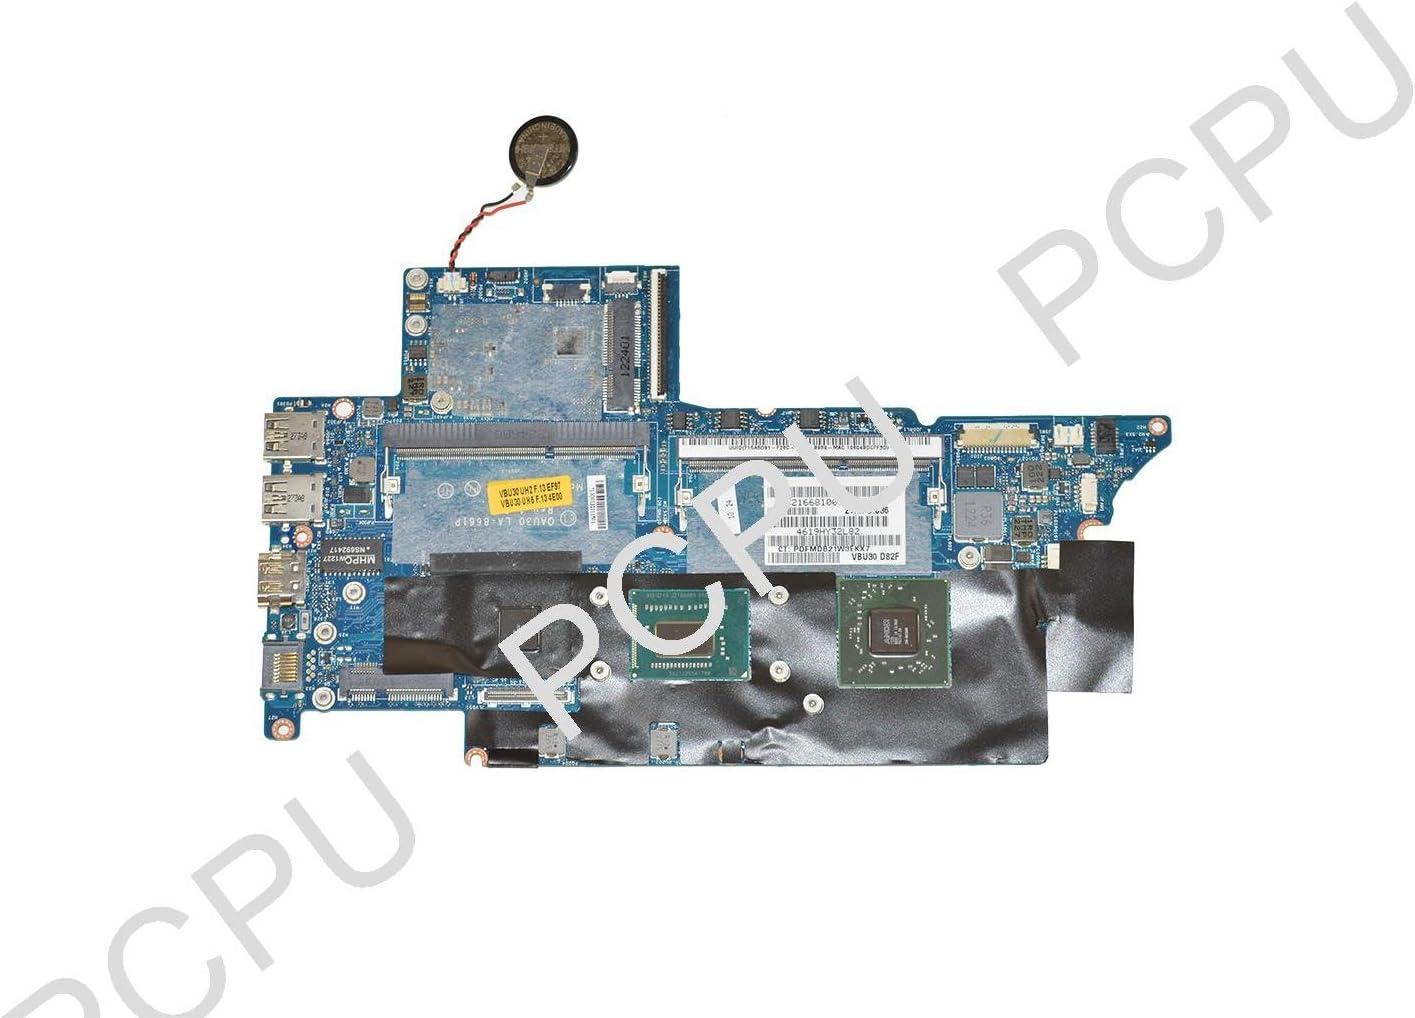 708966-501 HP Envy 4T-1100 Ultrabook Motherboard w/Intel i3-3217U 1.8Ghz CPU